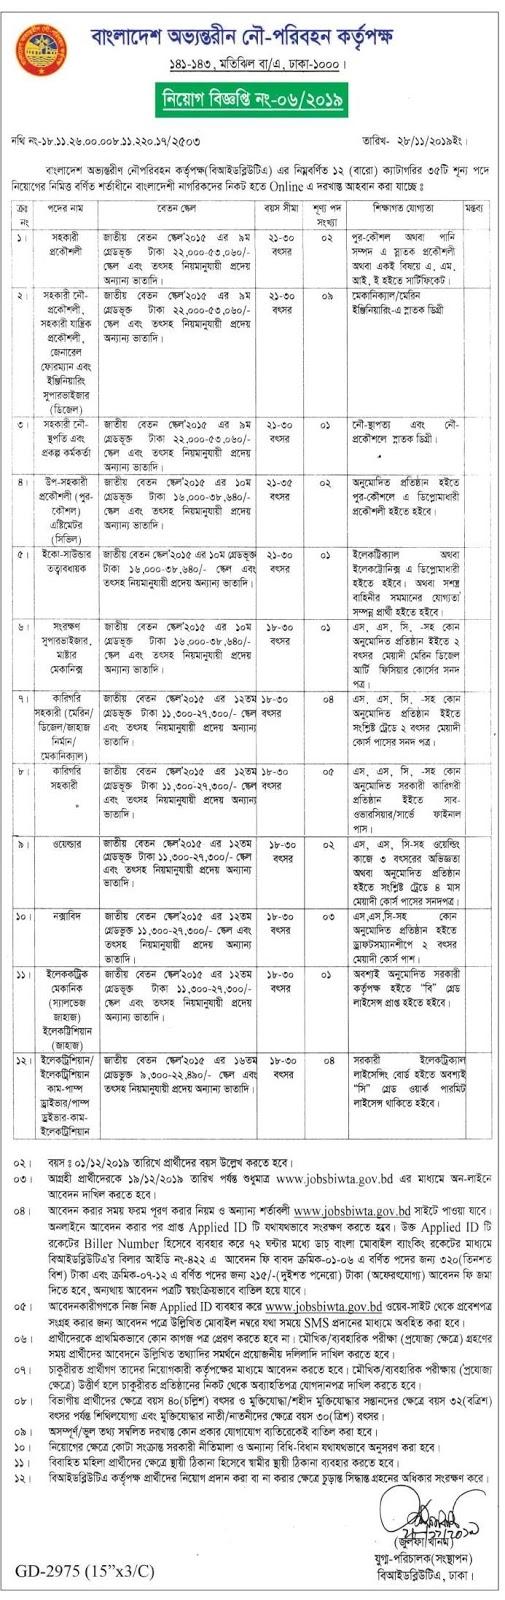 (BIWTA Job Circular in May 2019) বাংলাদেশ অভ্যন্তরীণ নৌ-পরিবহন কর্তৃপক্ষ